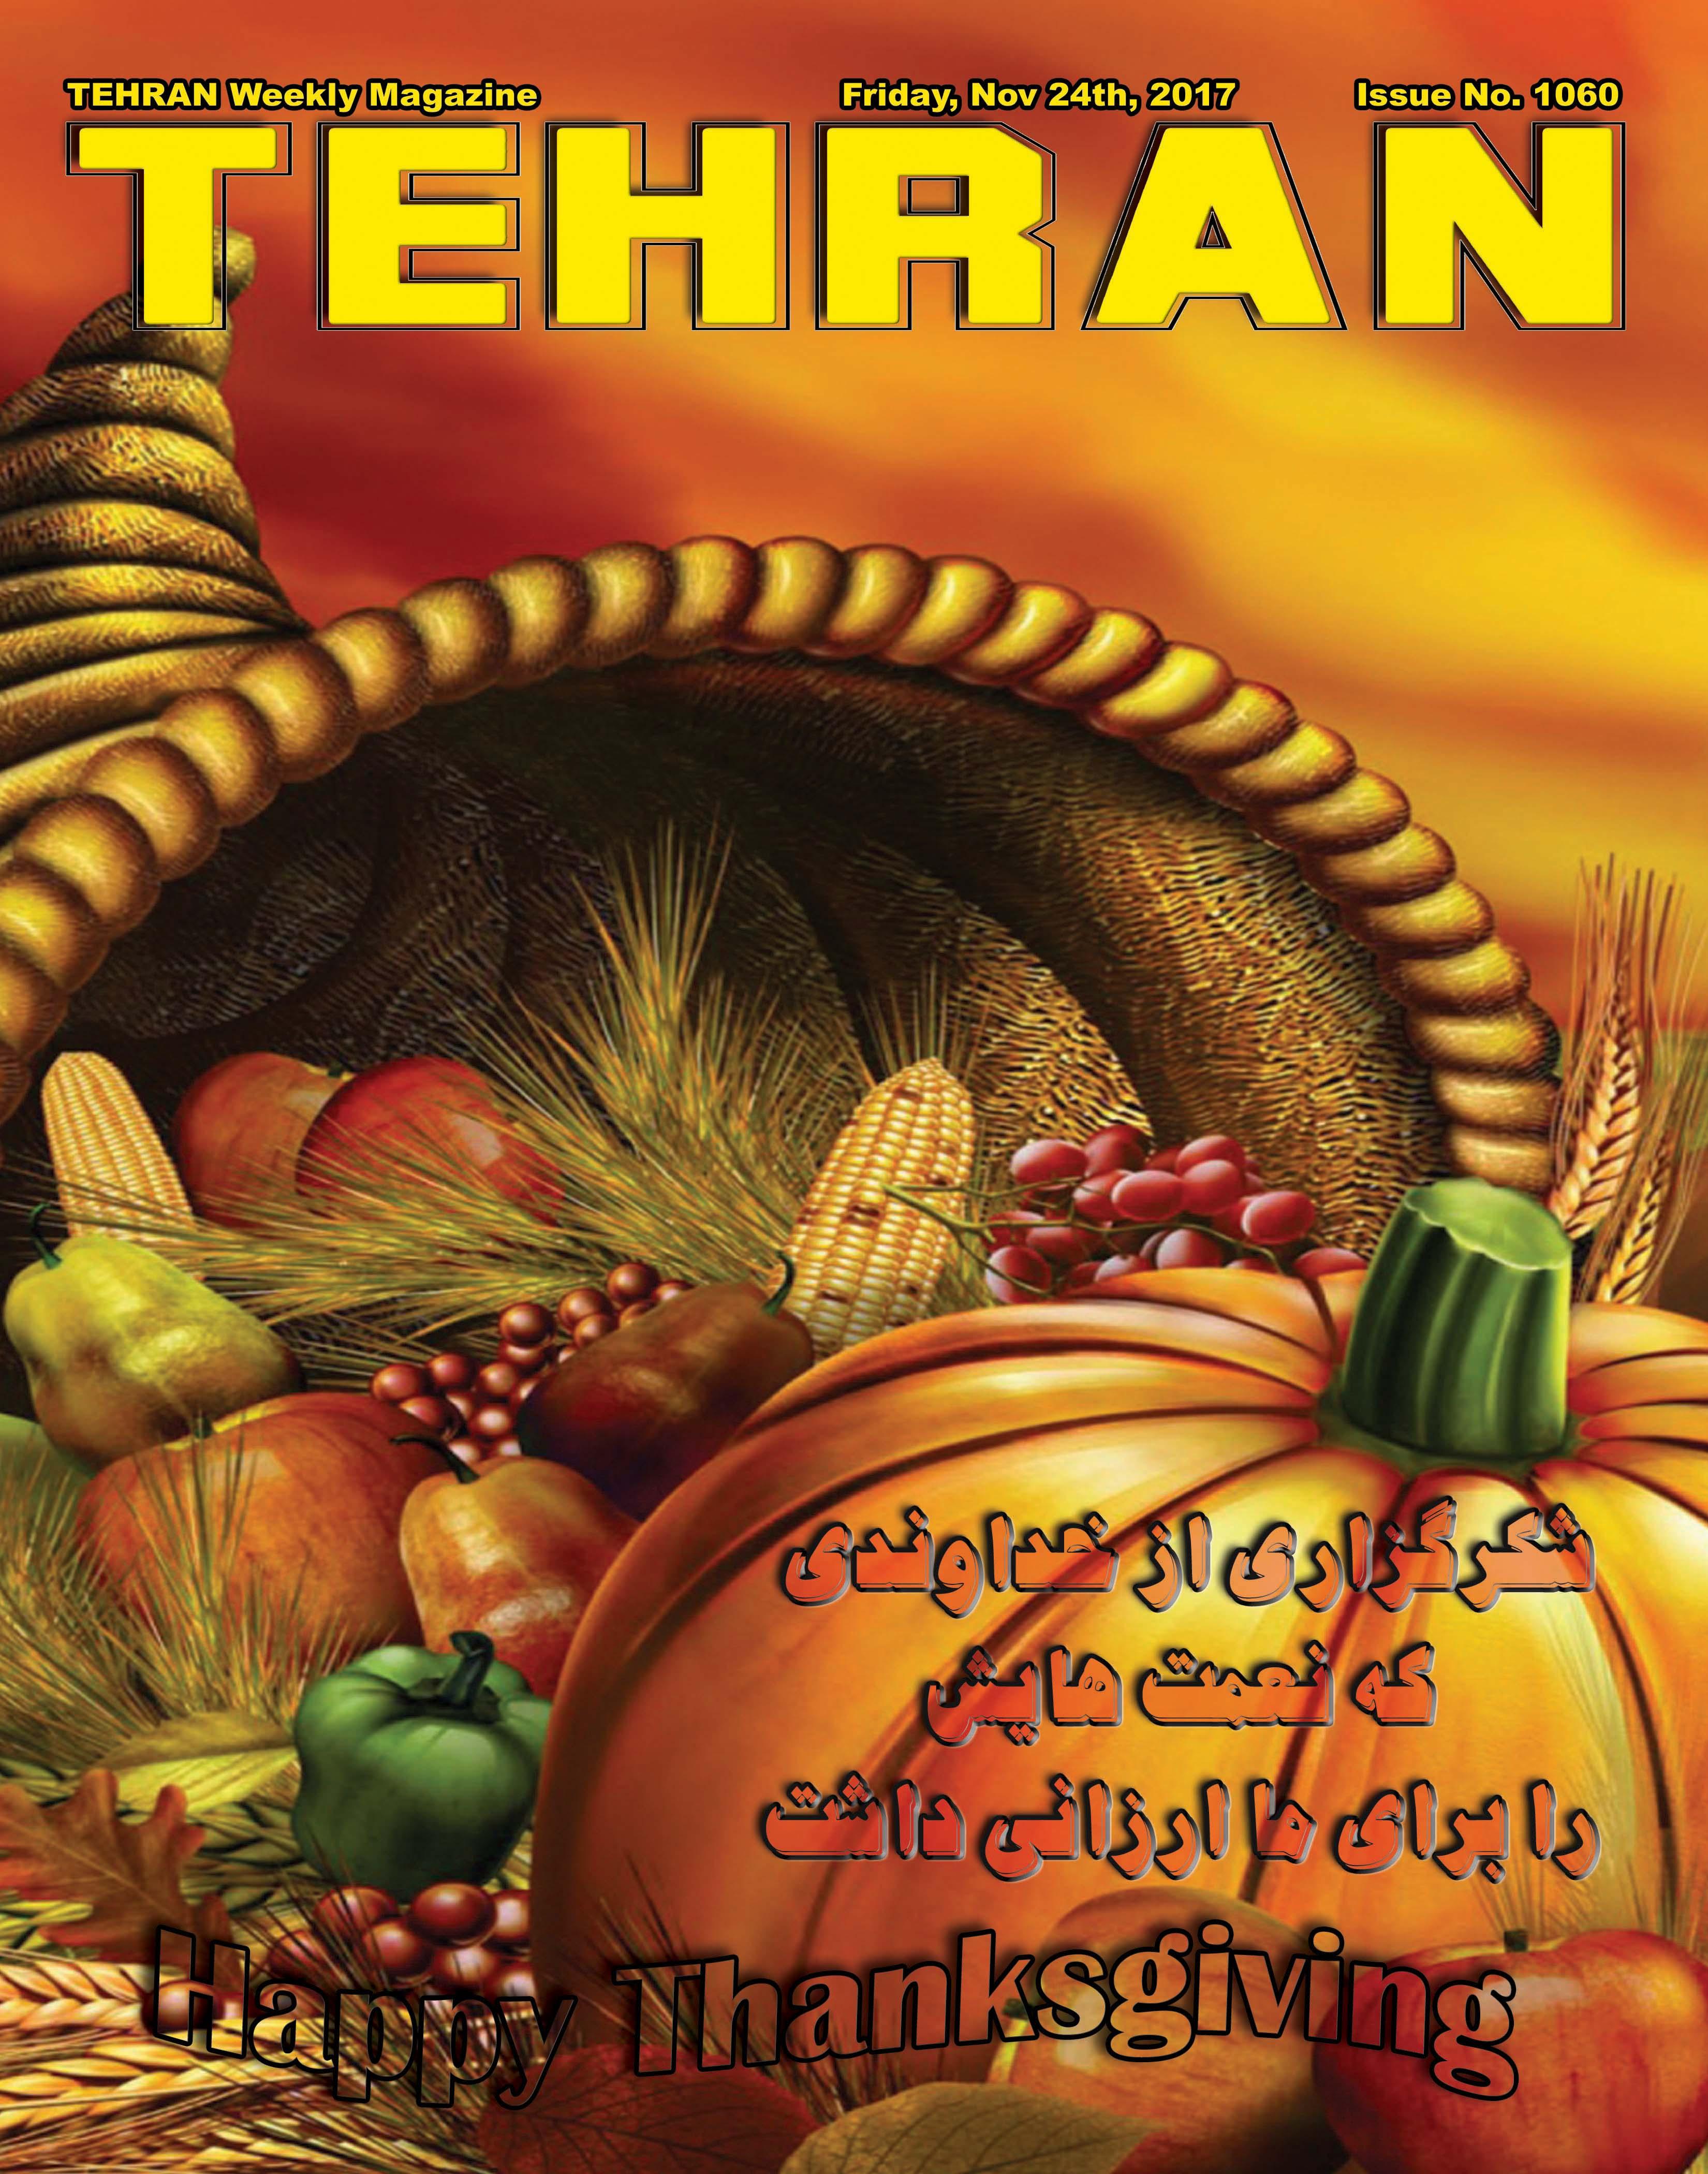 shahbod-noori-Thanksgiving